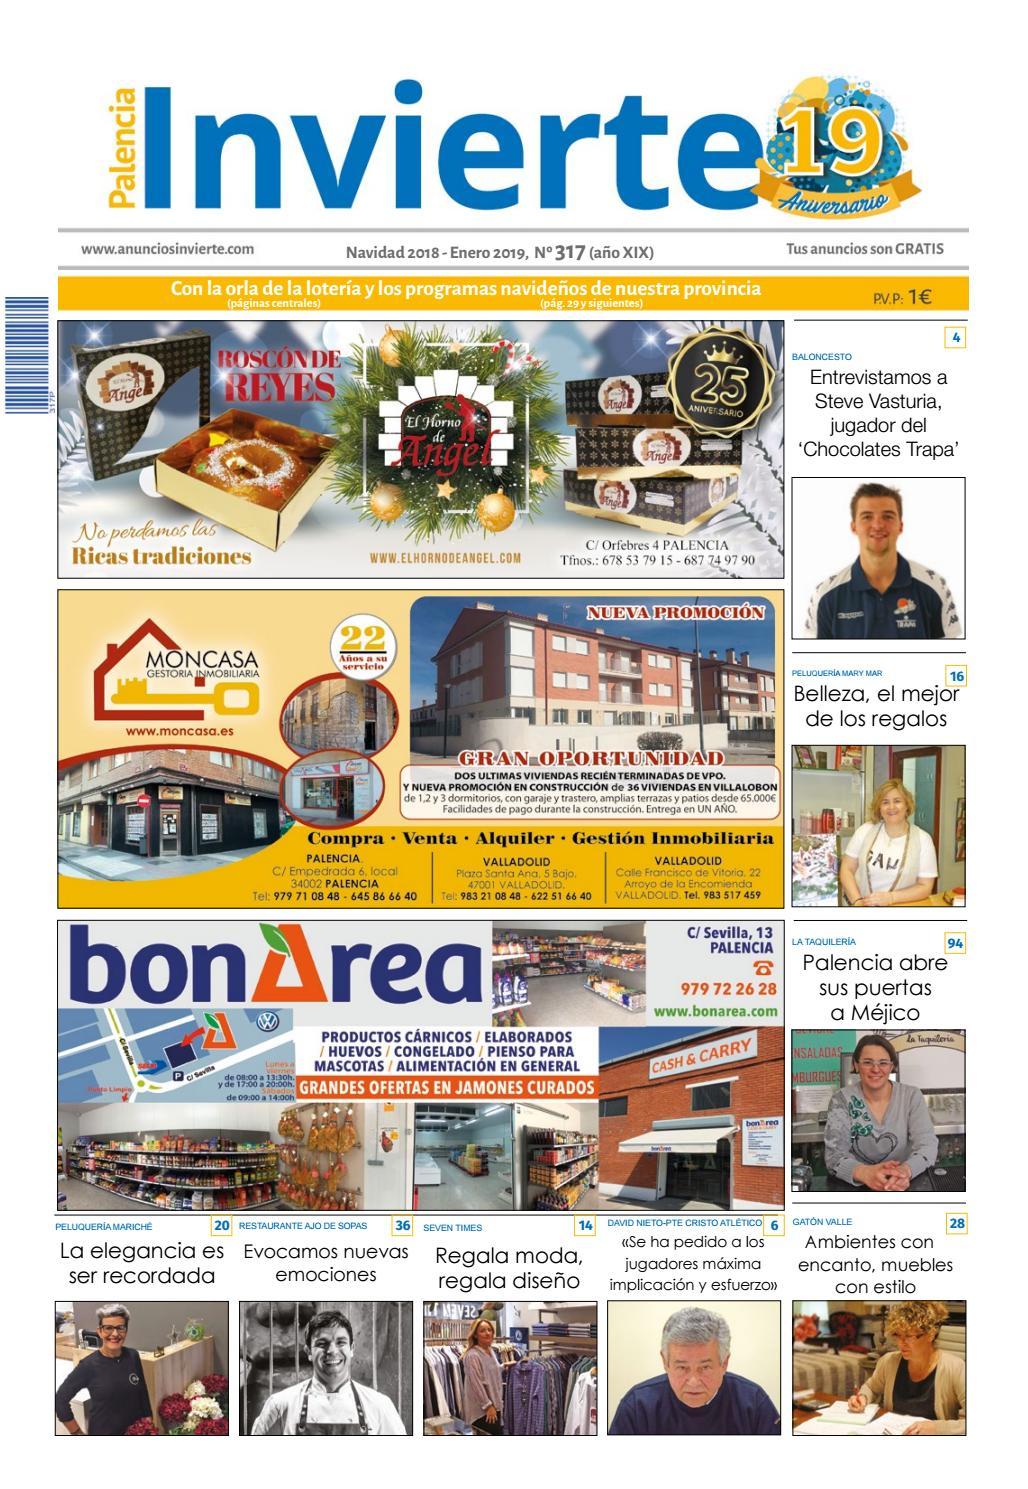 b179b7dc2a 317 Navidad 2108 - Enero 2019 by Periódicos Invierte Palencia - issuu